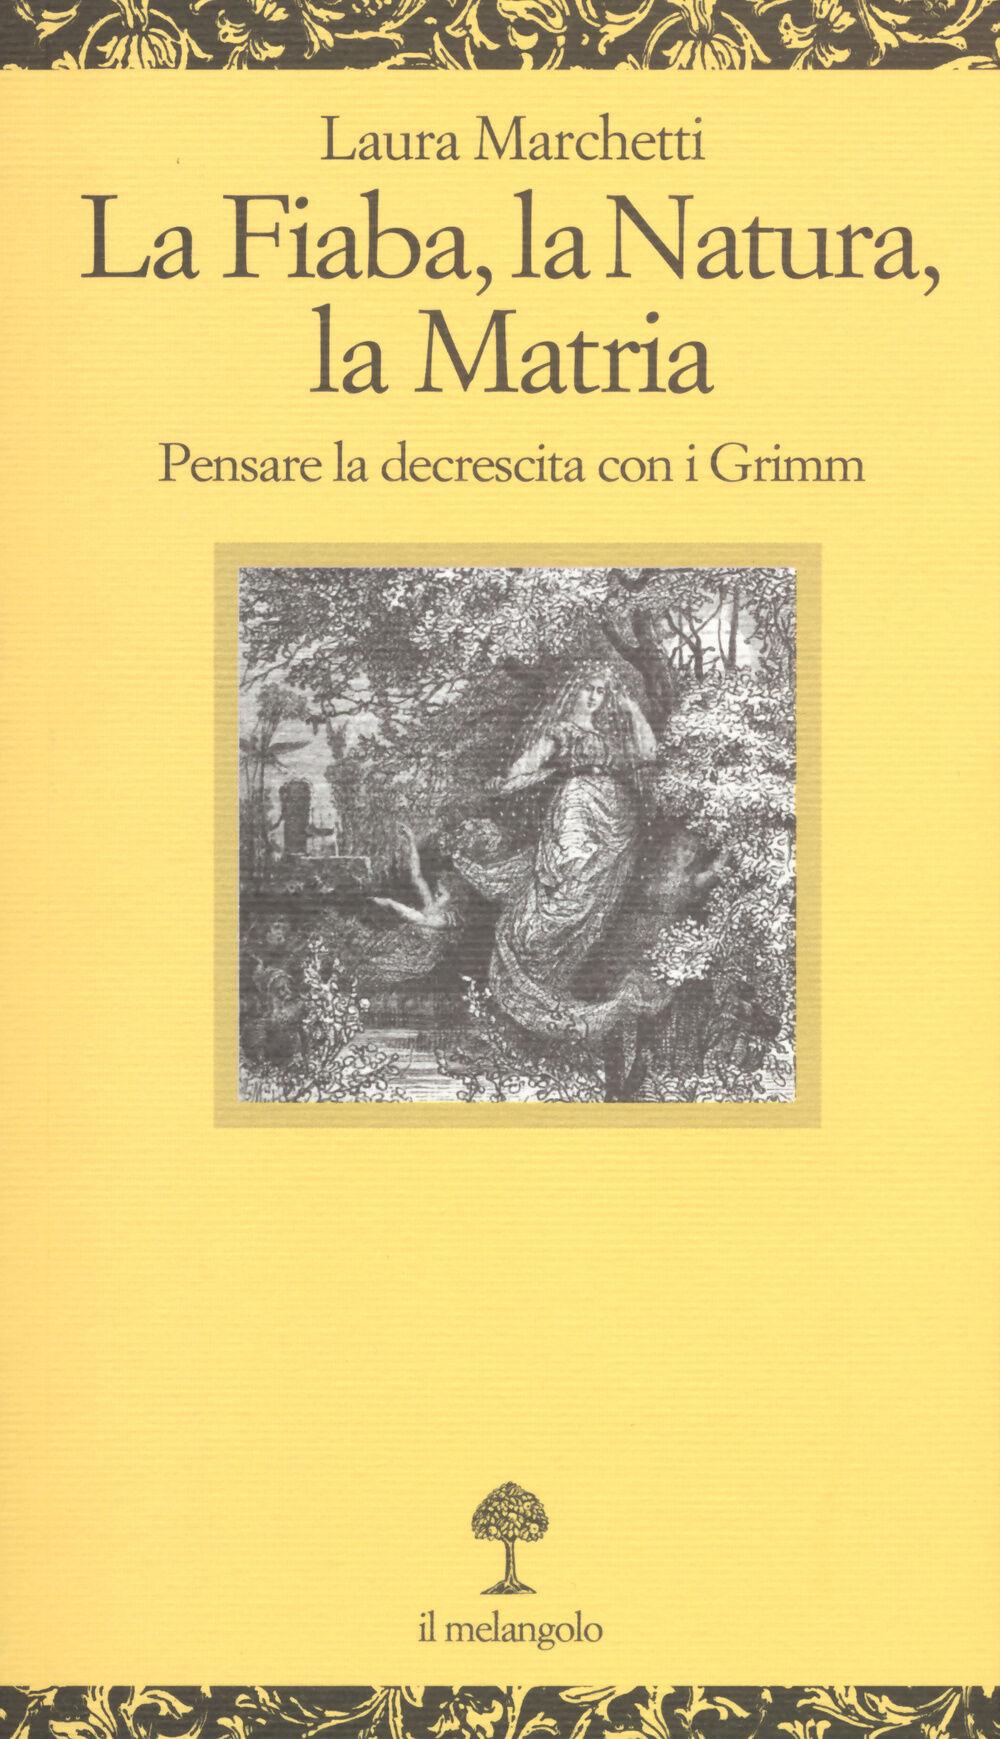 La fiaba, la natura, la matria. Pensare la decrescita con i Grimm